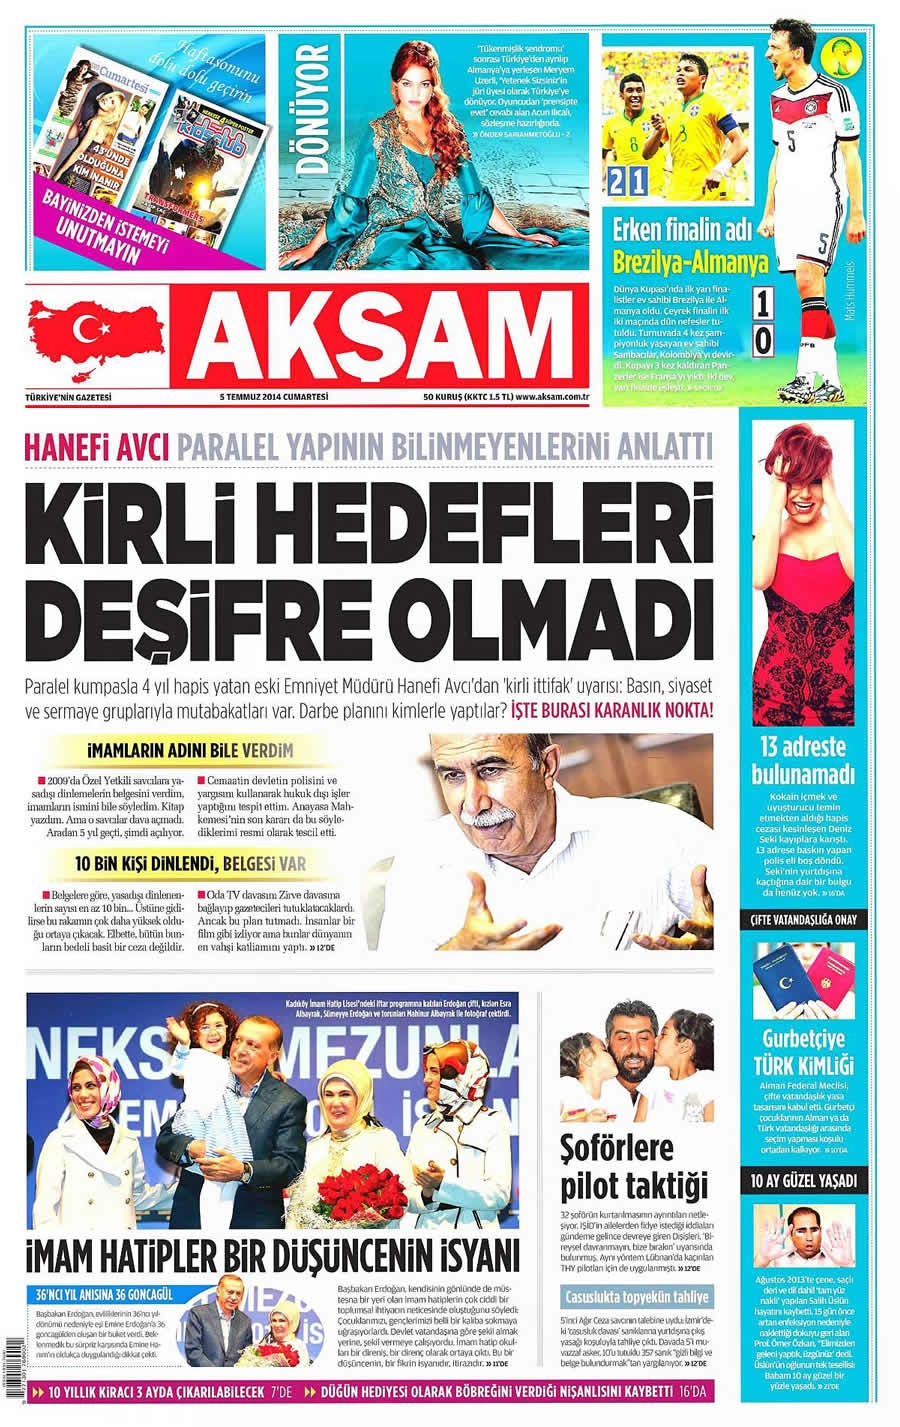 8 Temmuz Gazete Manşetleri galerisi resim 1